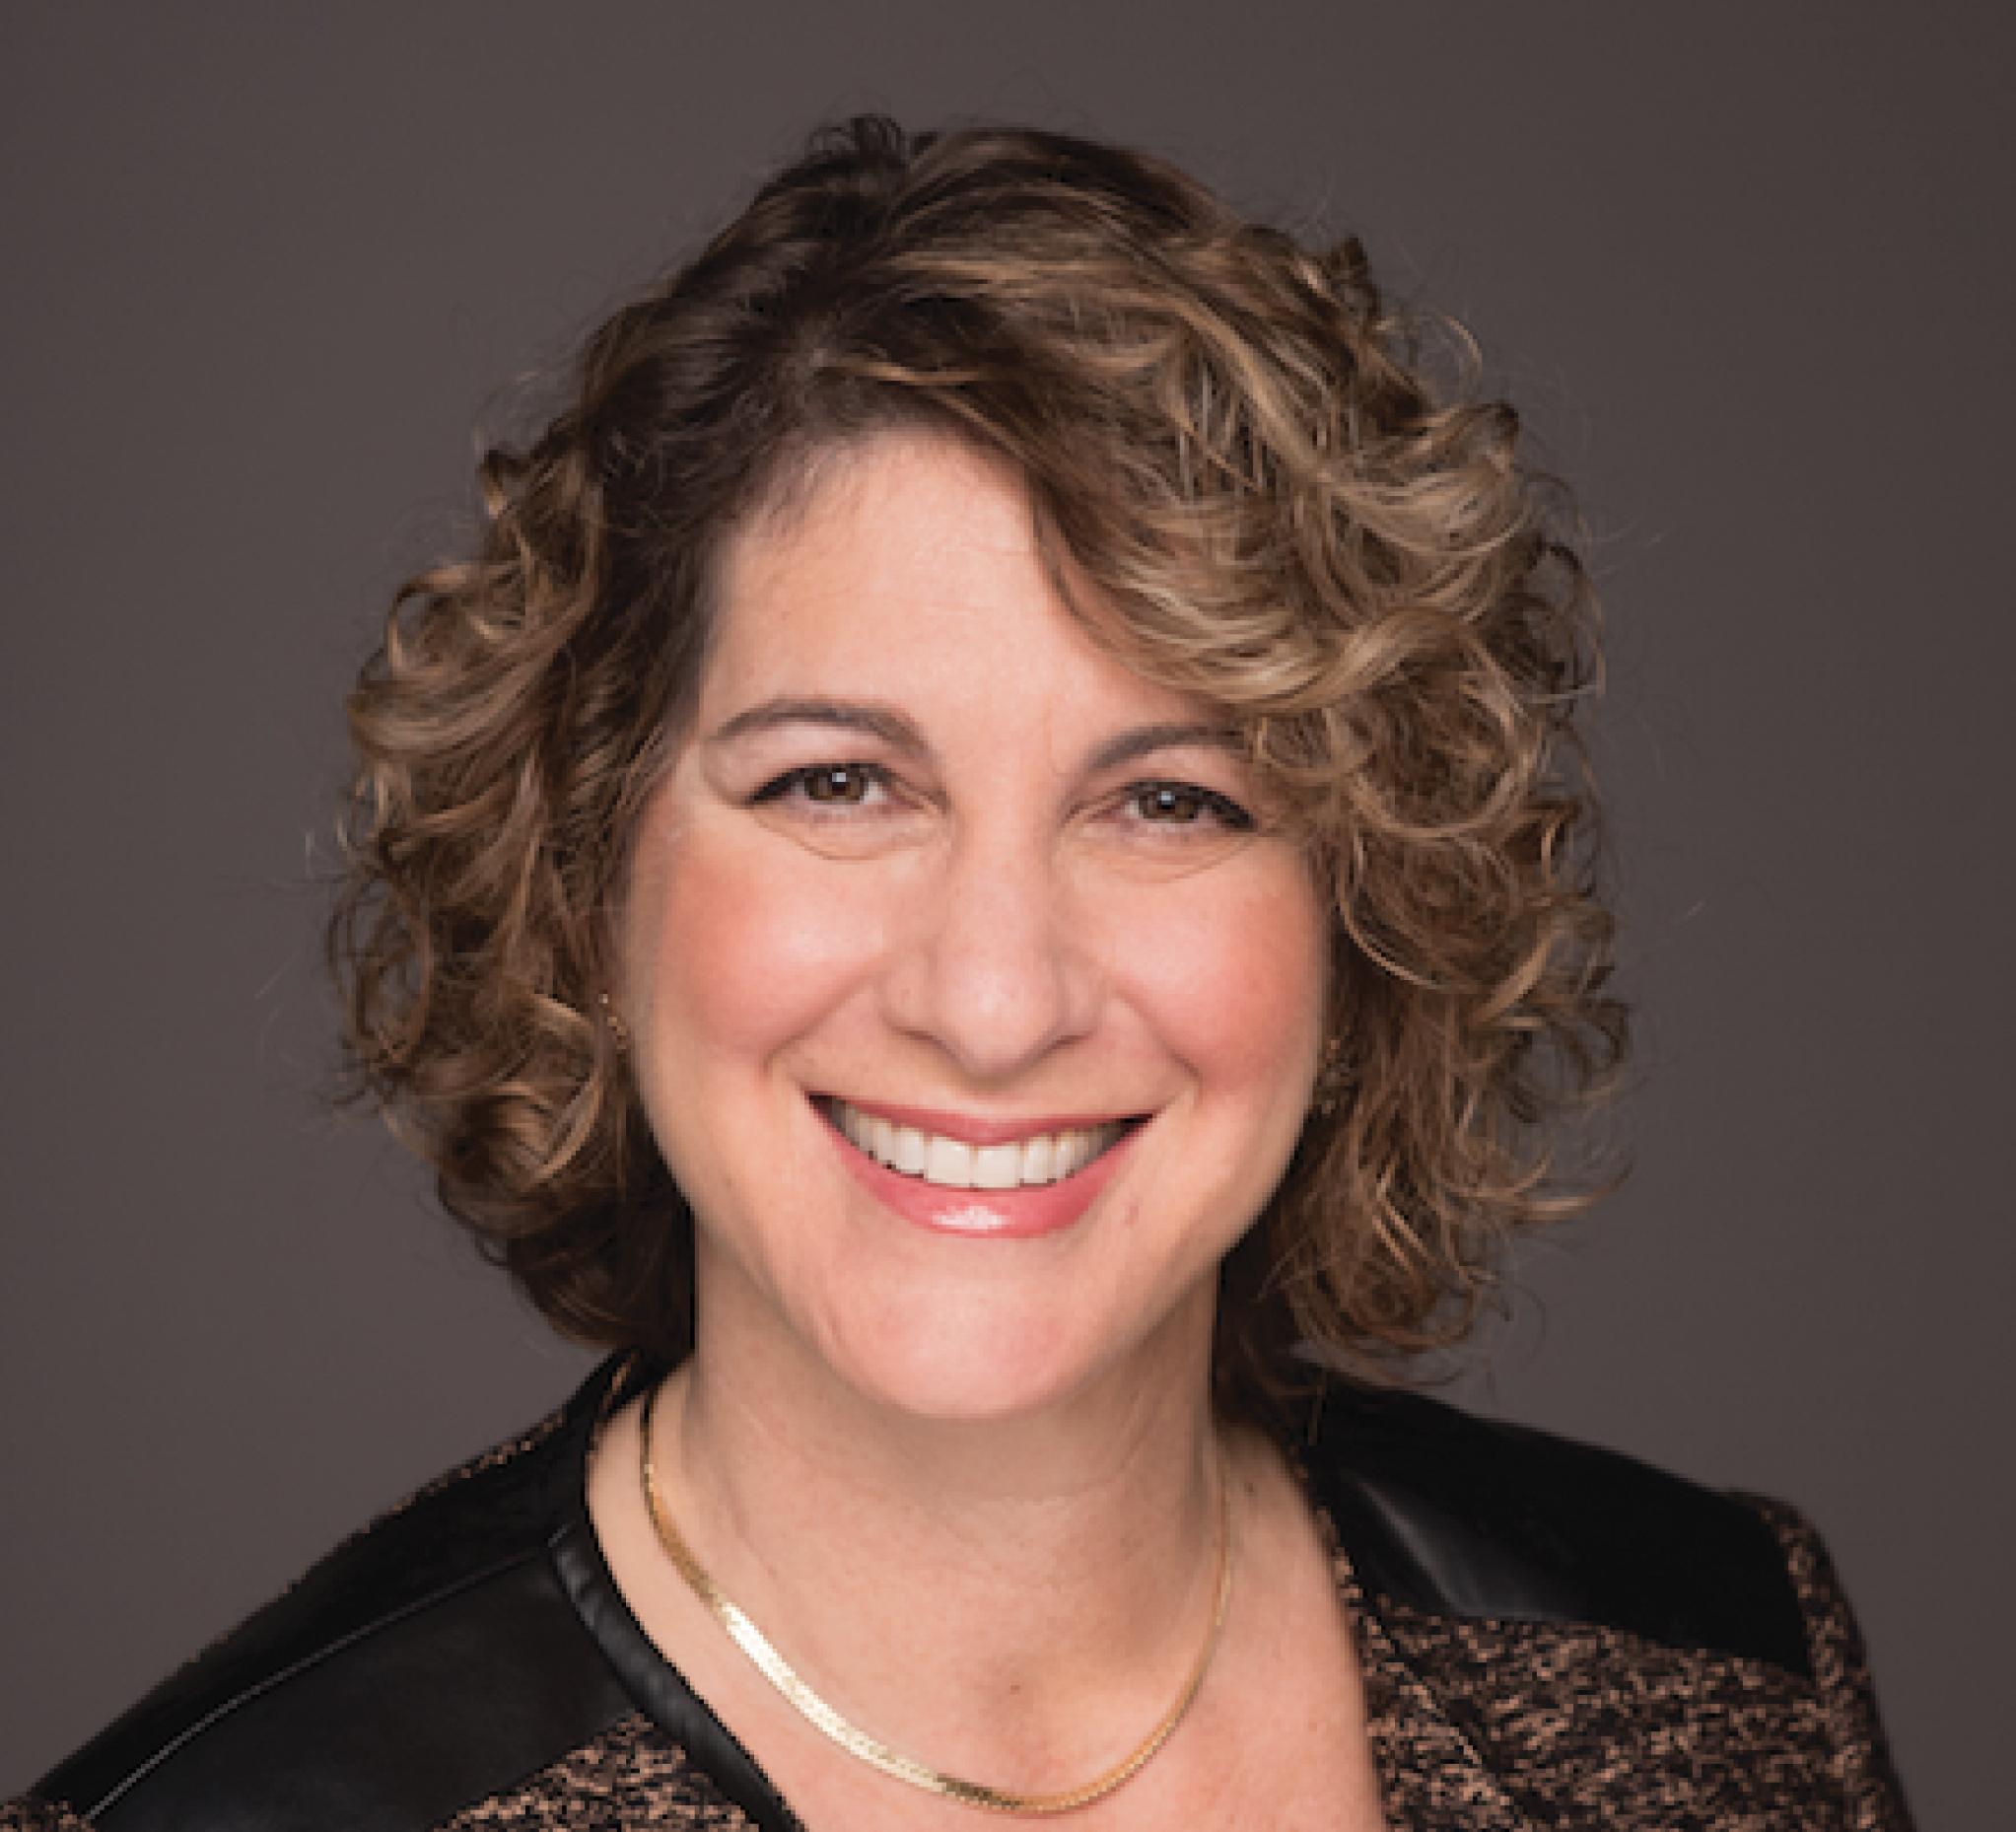 Dr. Samantha Ravich